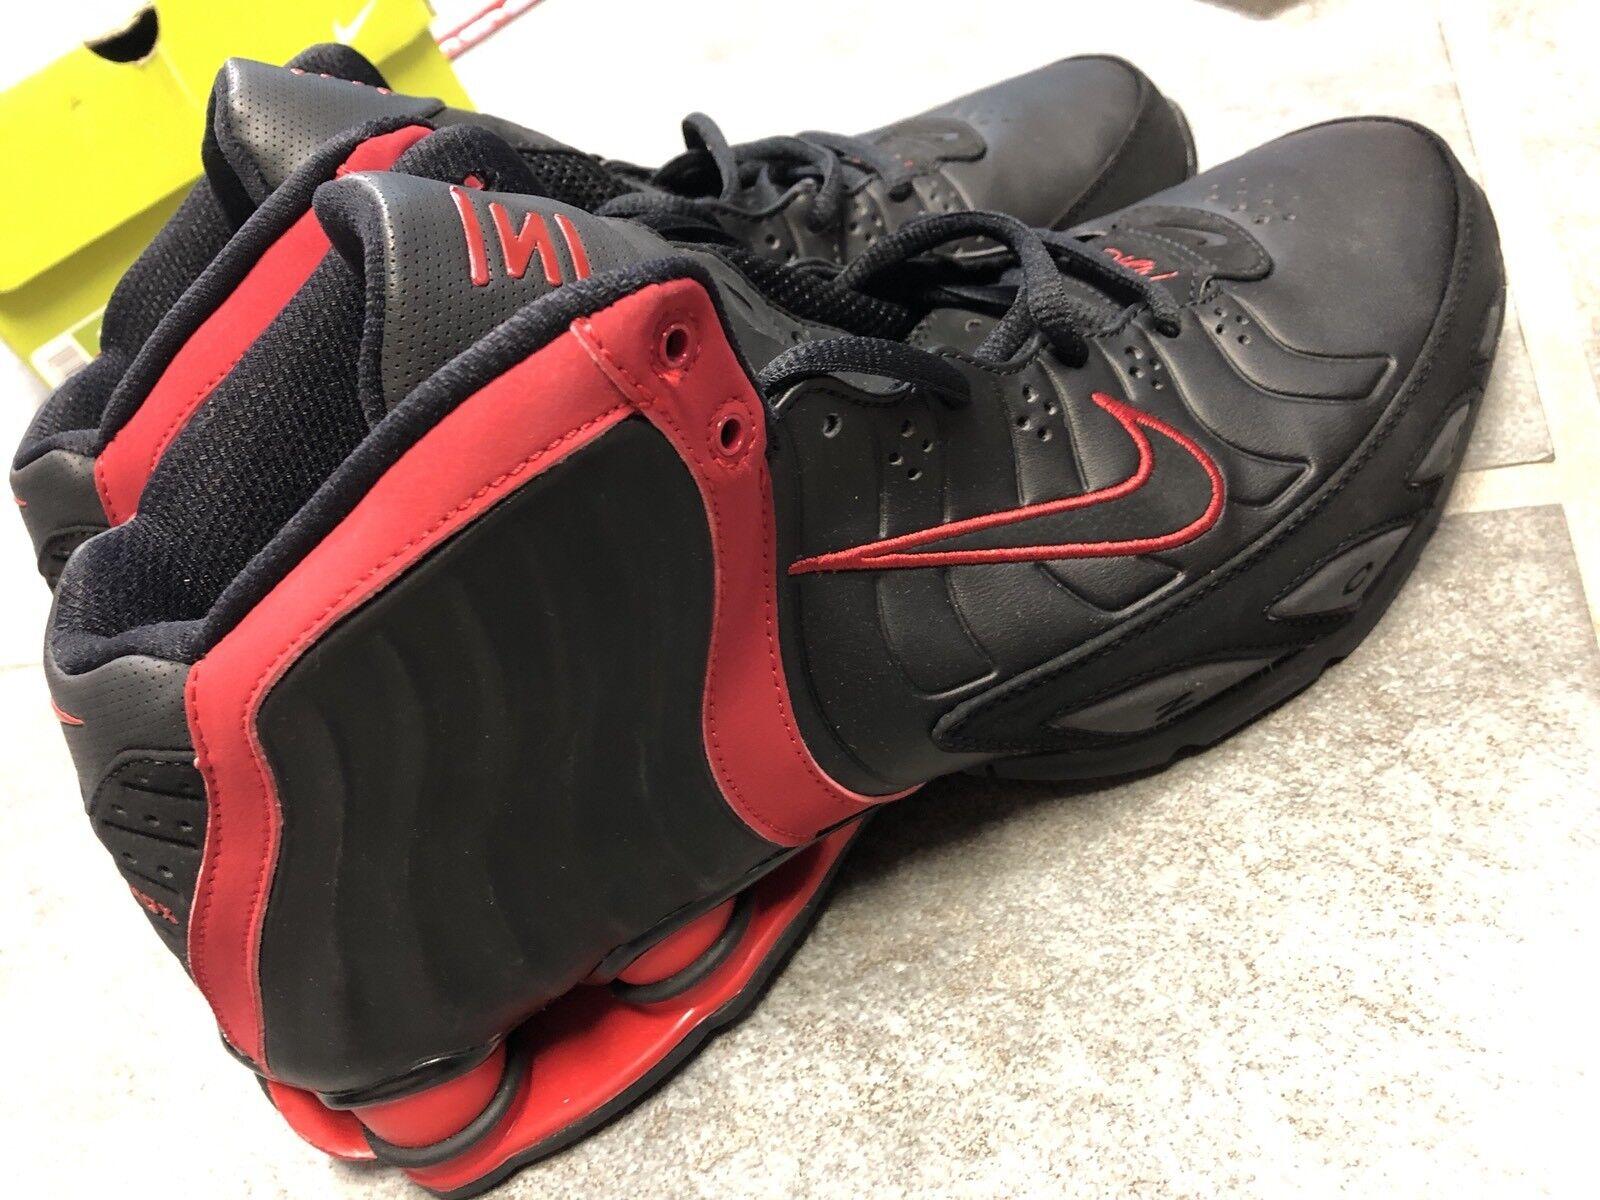 nike shox flug tödlich tb zoom - basketball - - schuhe größe 11 schwarz - - rot 2005 vc 18afc9